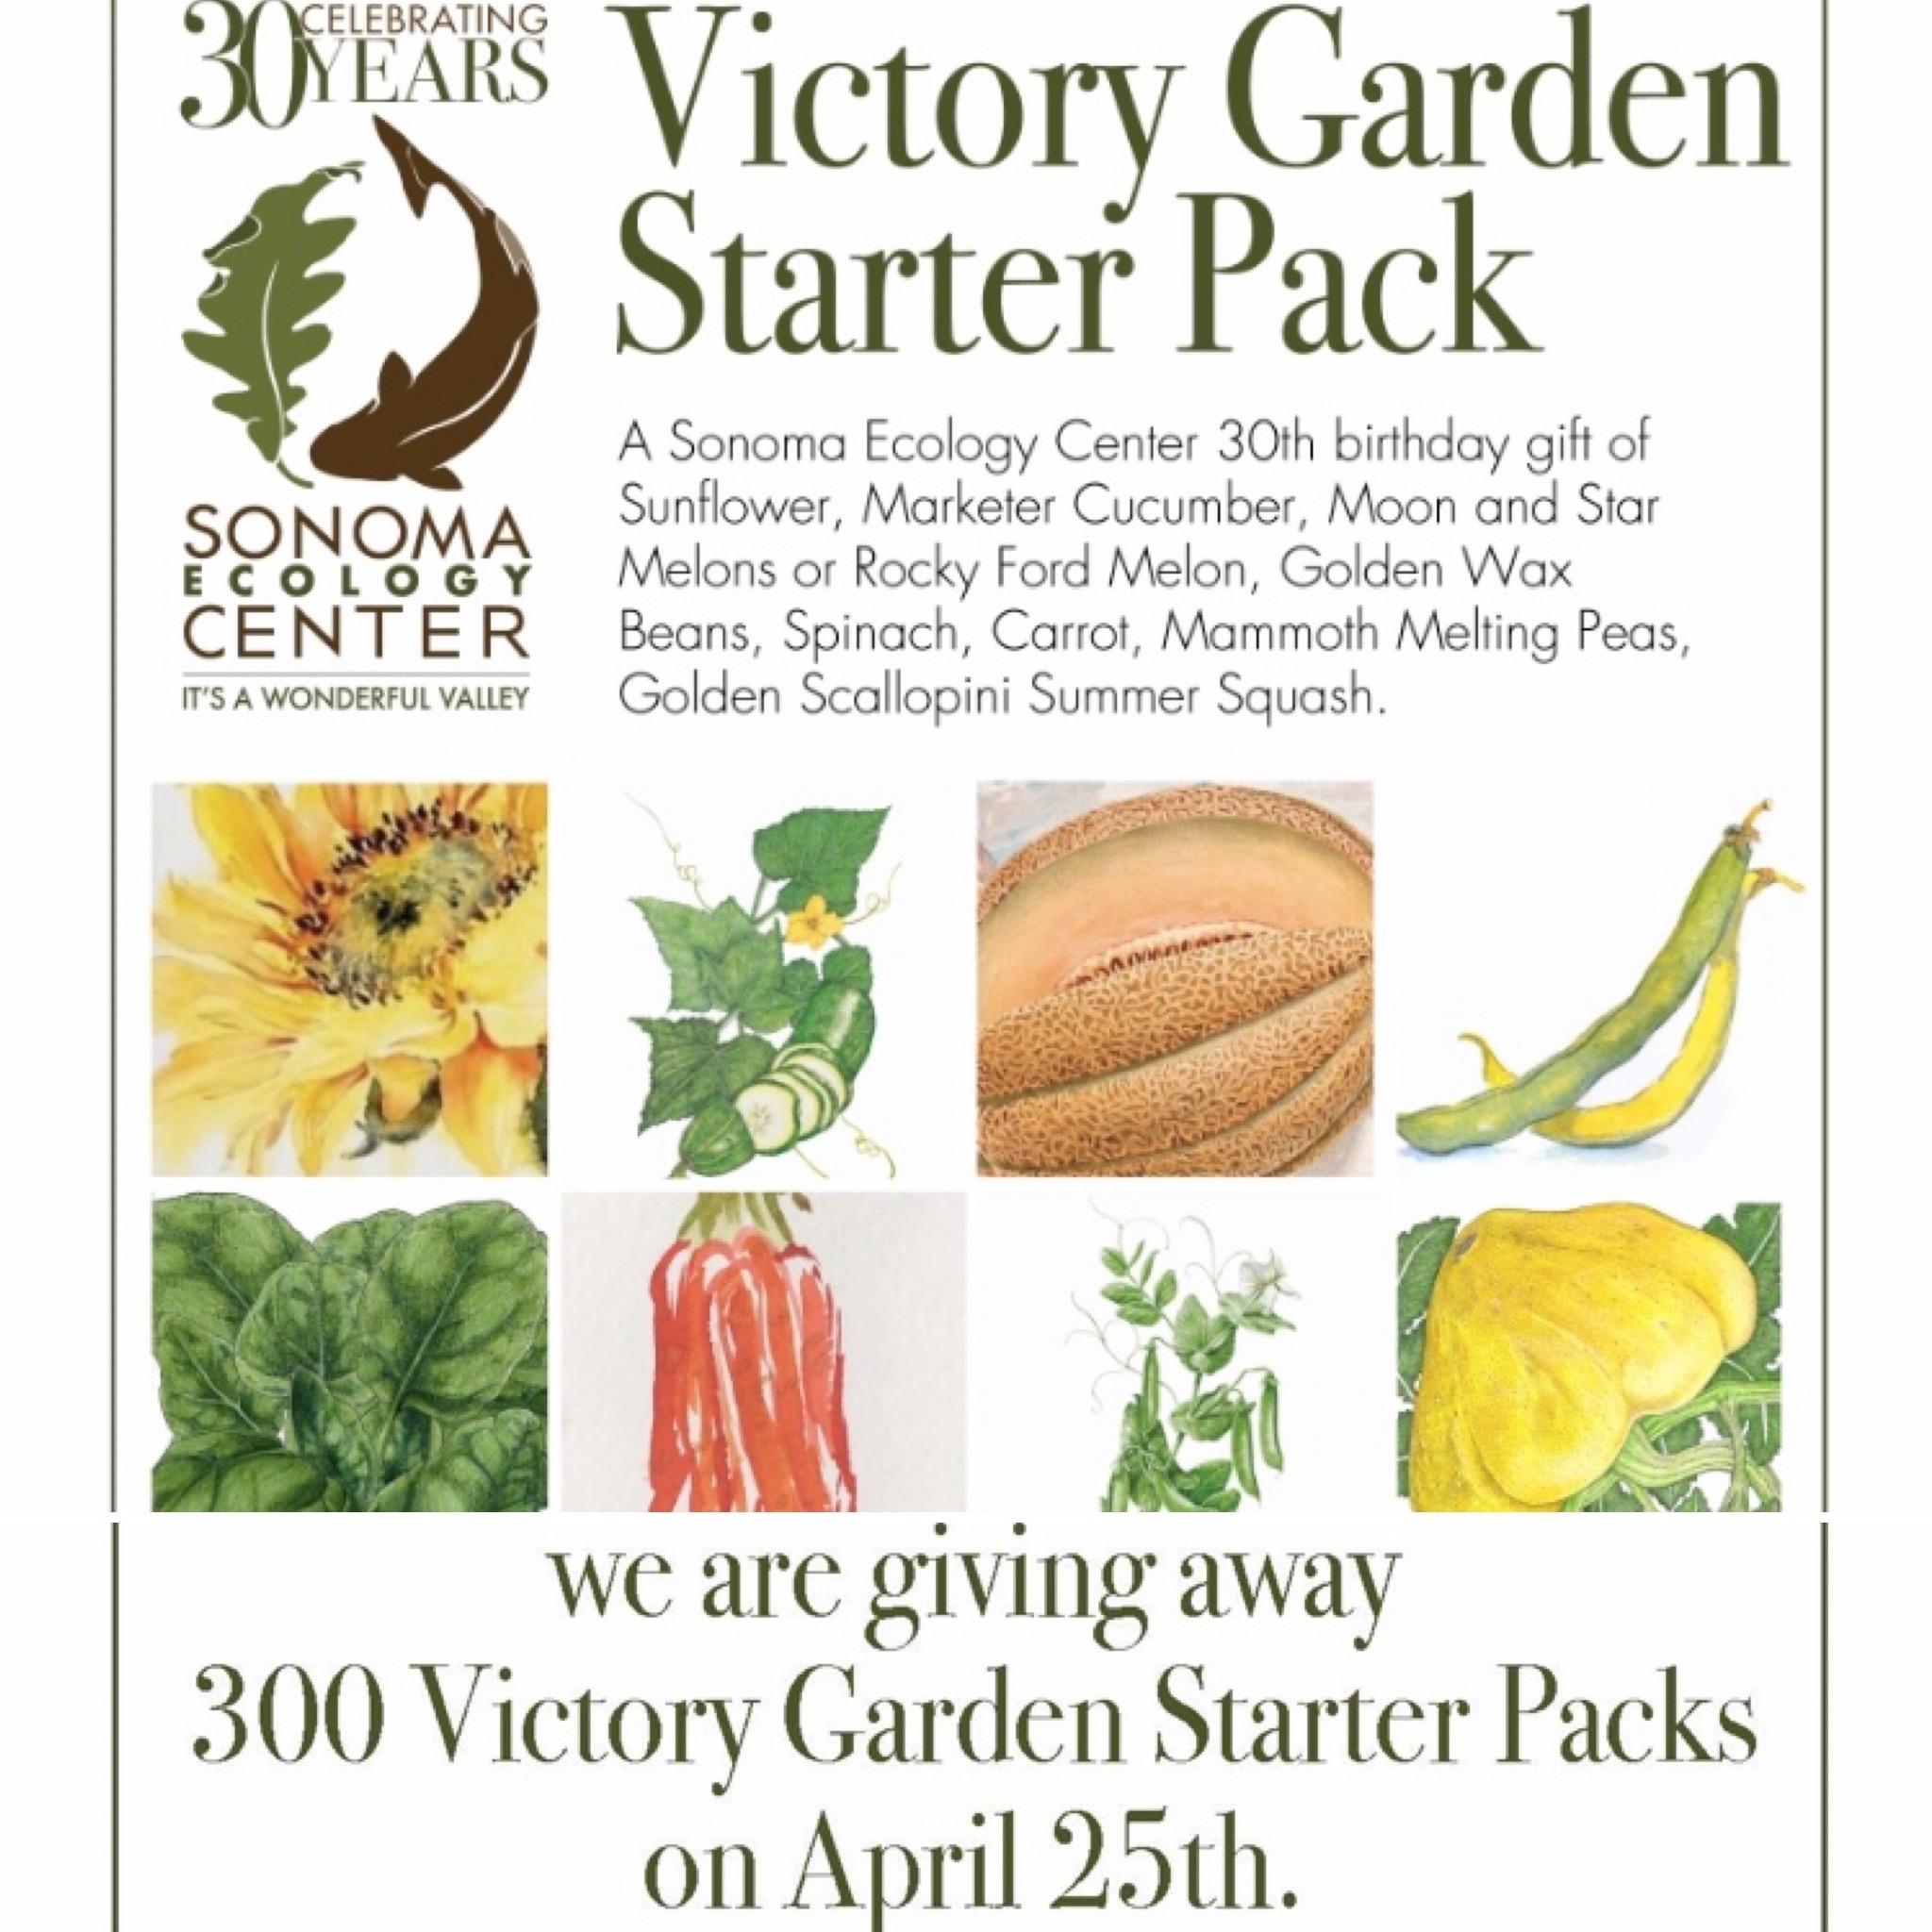 Victory Gardens Starter Pack